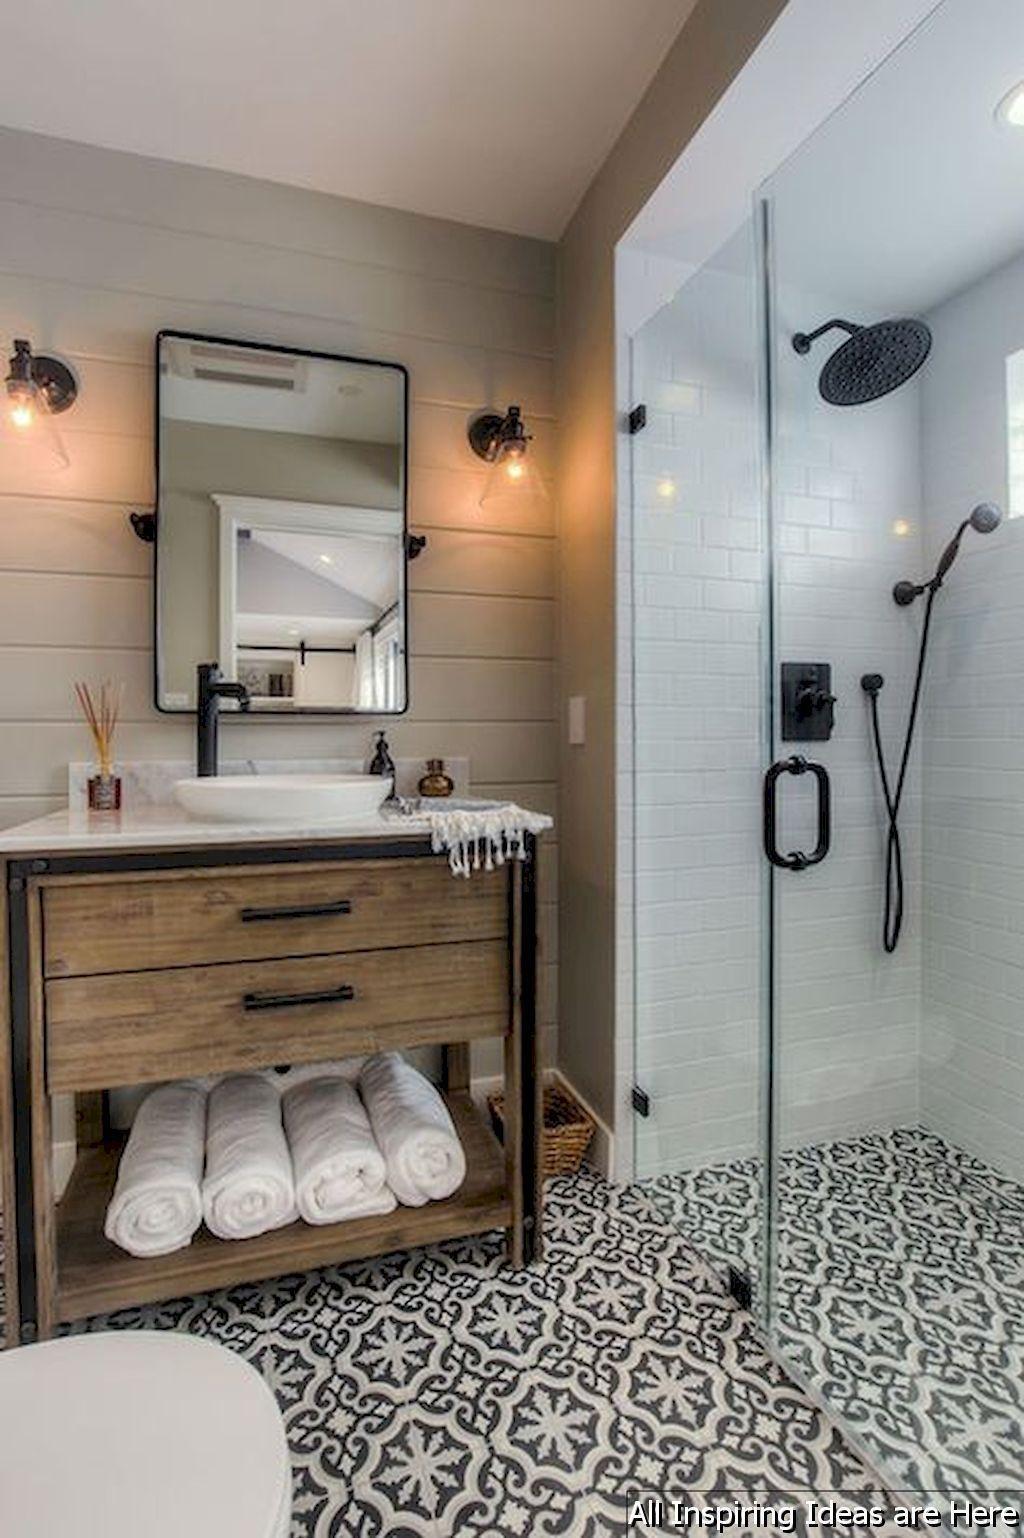 100 Great Minimalist Modern Bathroom Ideas 20 Rustic Bathroom Designs Bathroom Remodel Master Small Bathroom Remodel